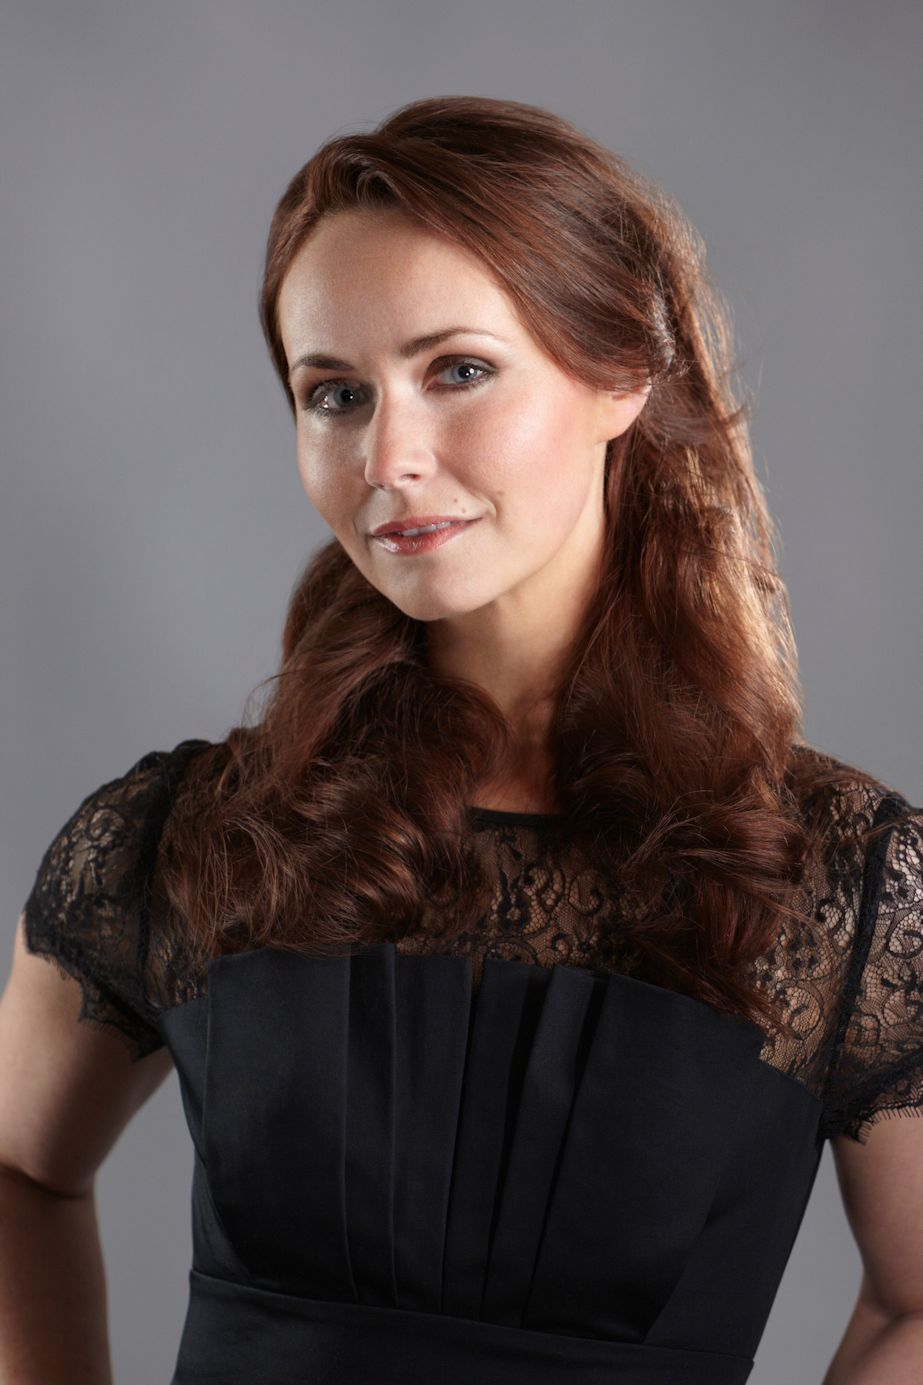 Zoe Rainey, Face of Denman Summer hair care, Irish actors